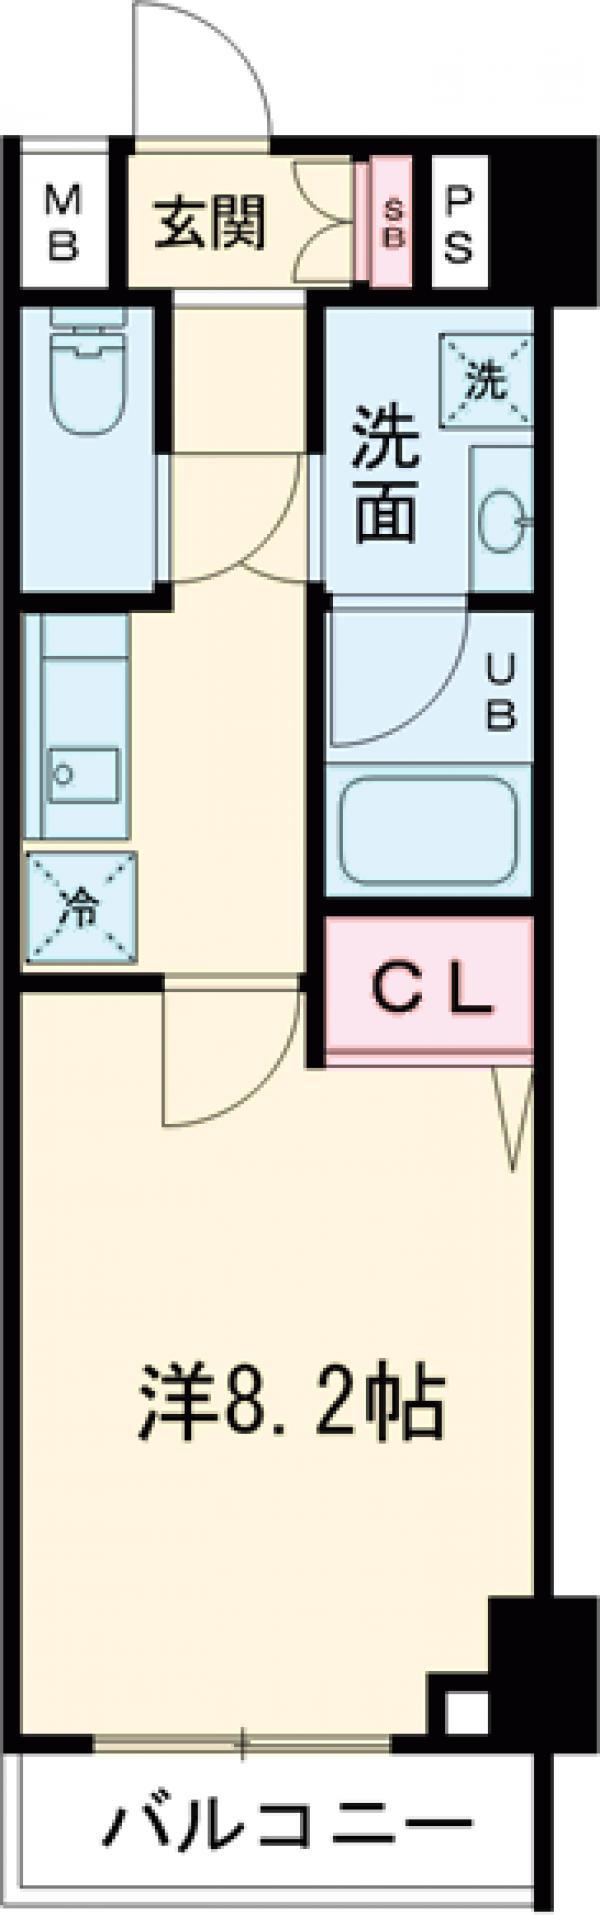 GENOVIA西高島平skygarden・703号室の間取り